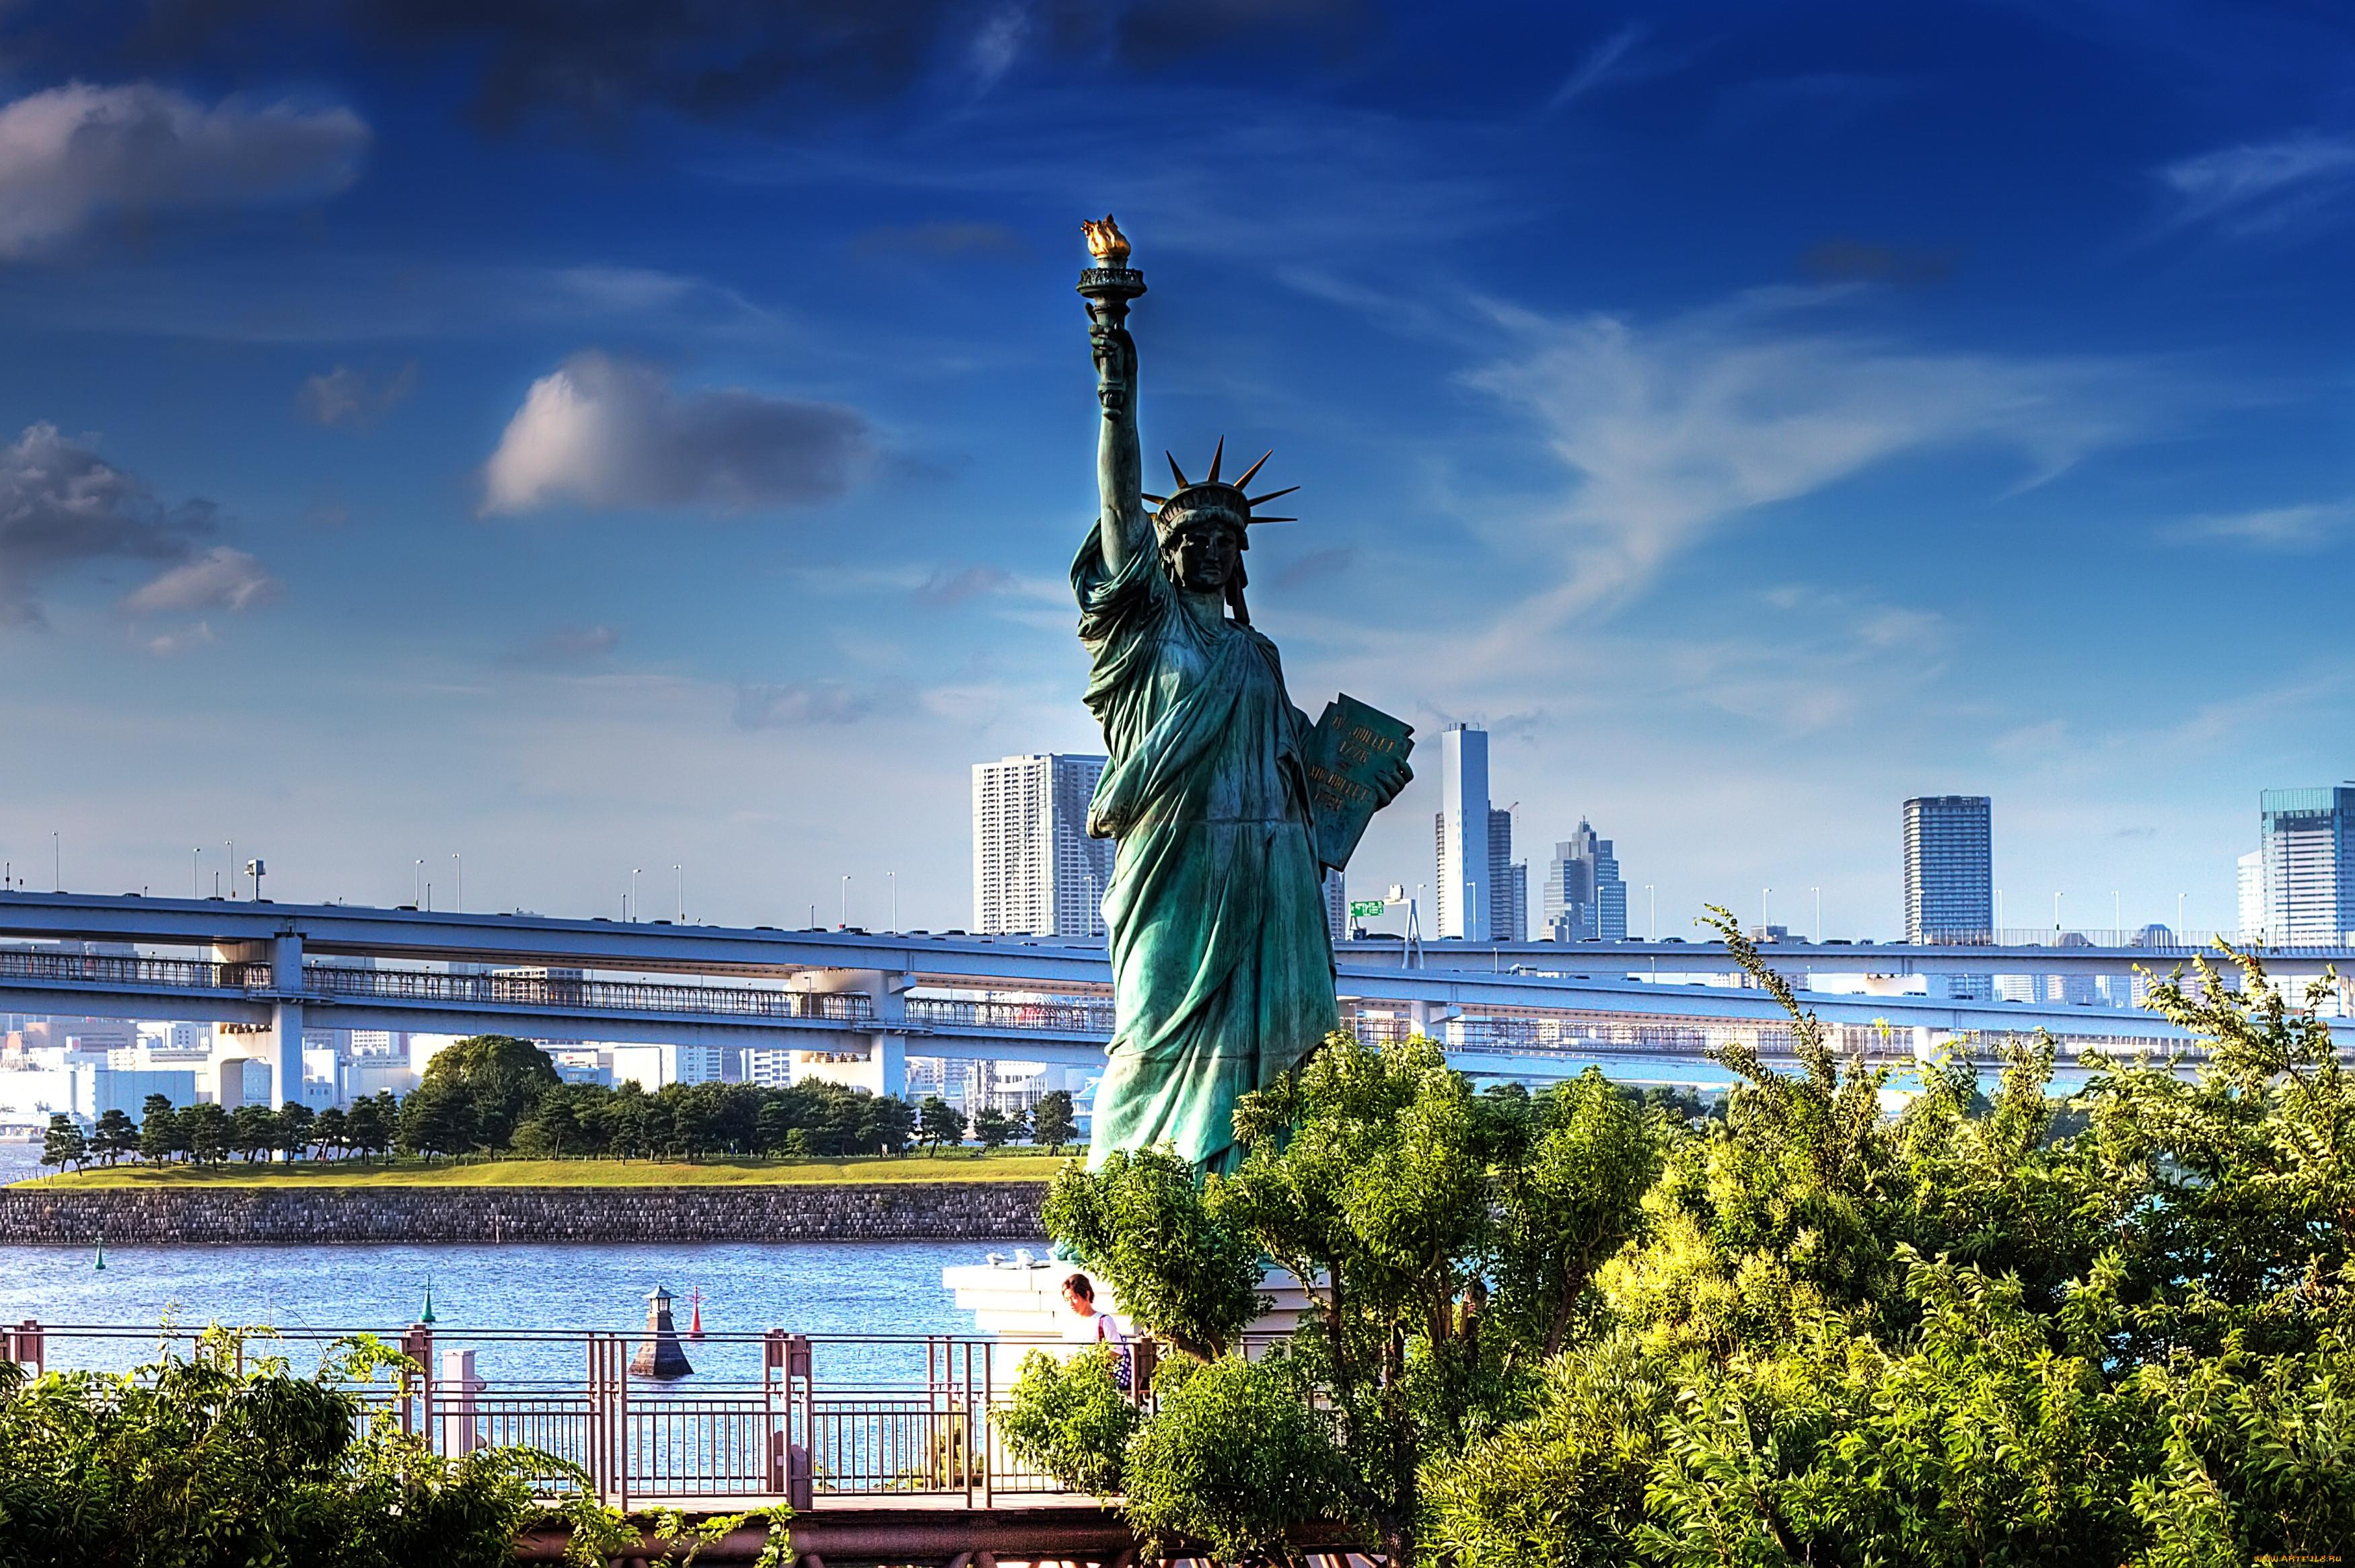 картинки нью-йорк на рабочий стол